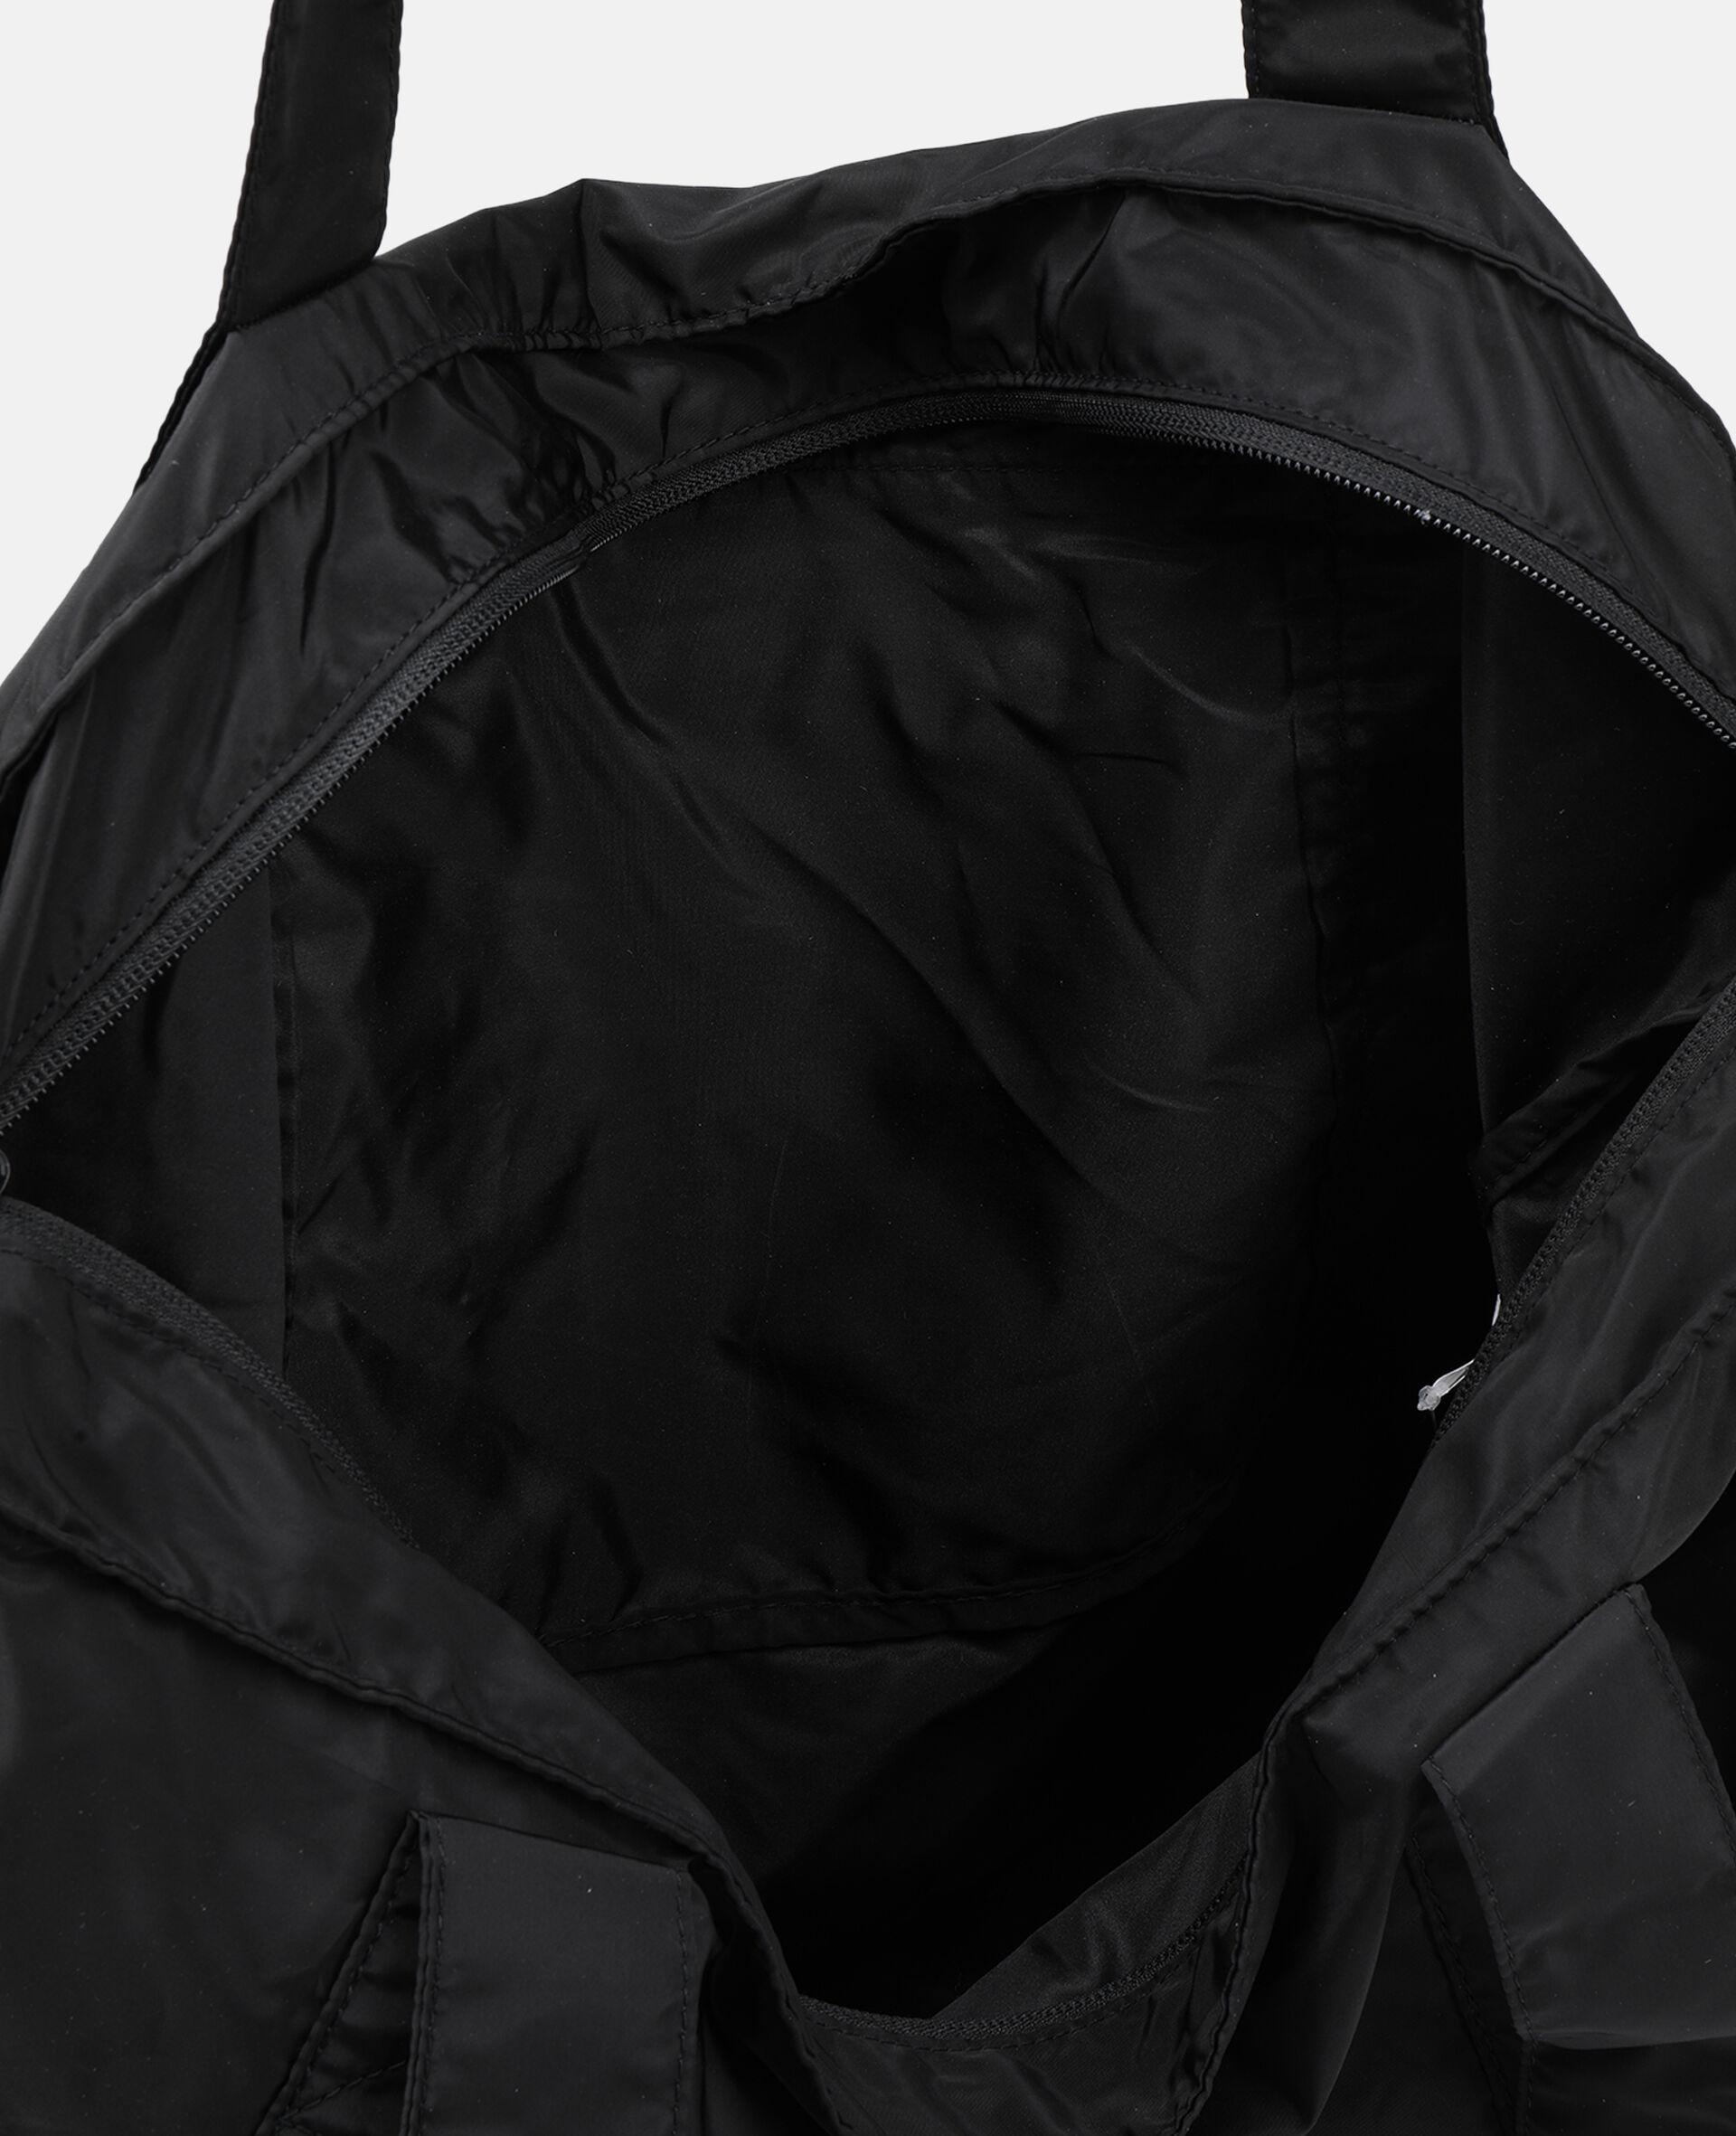 Black Printed Tote Bag -Black-large image number 2